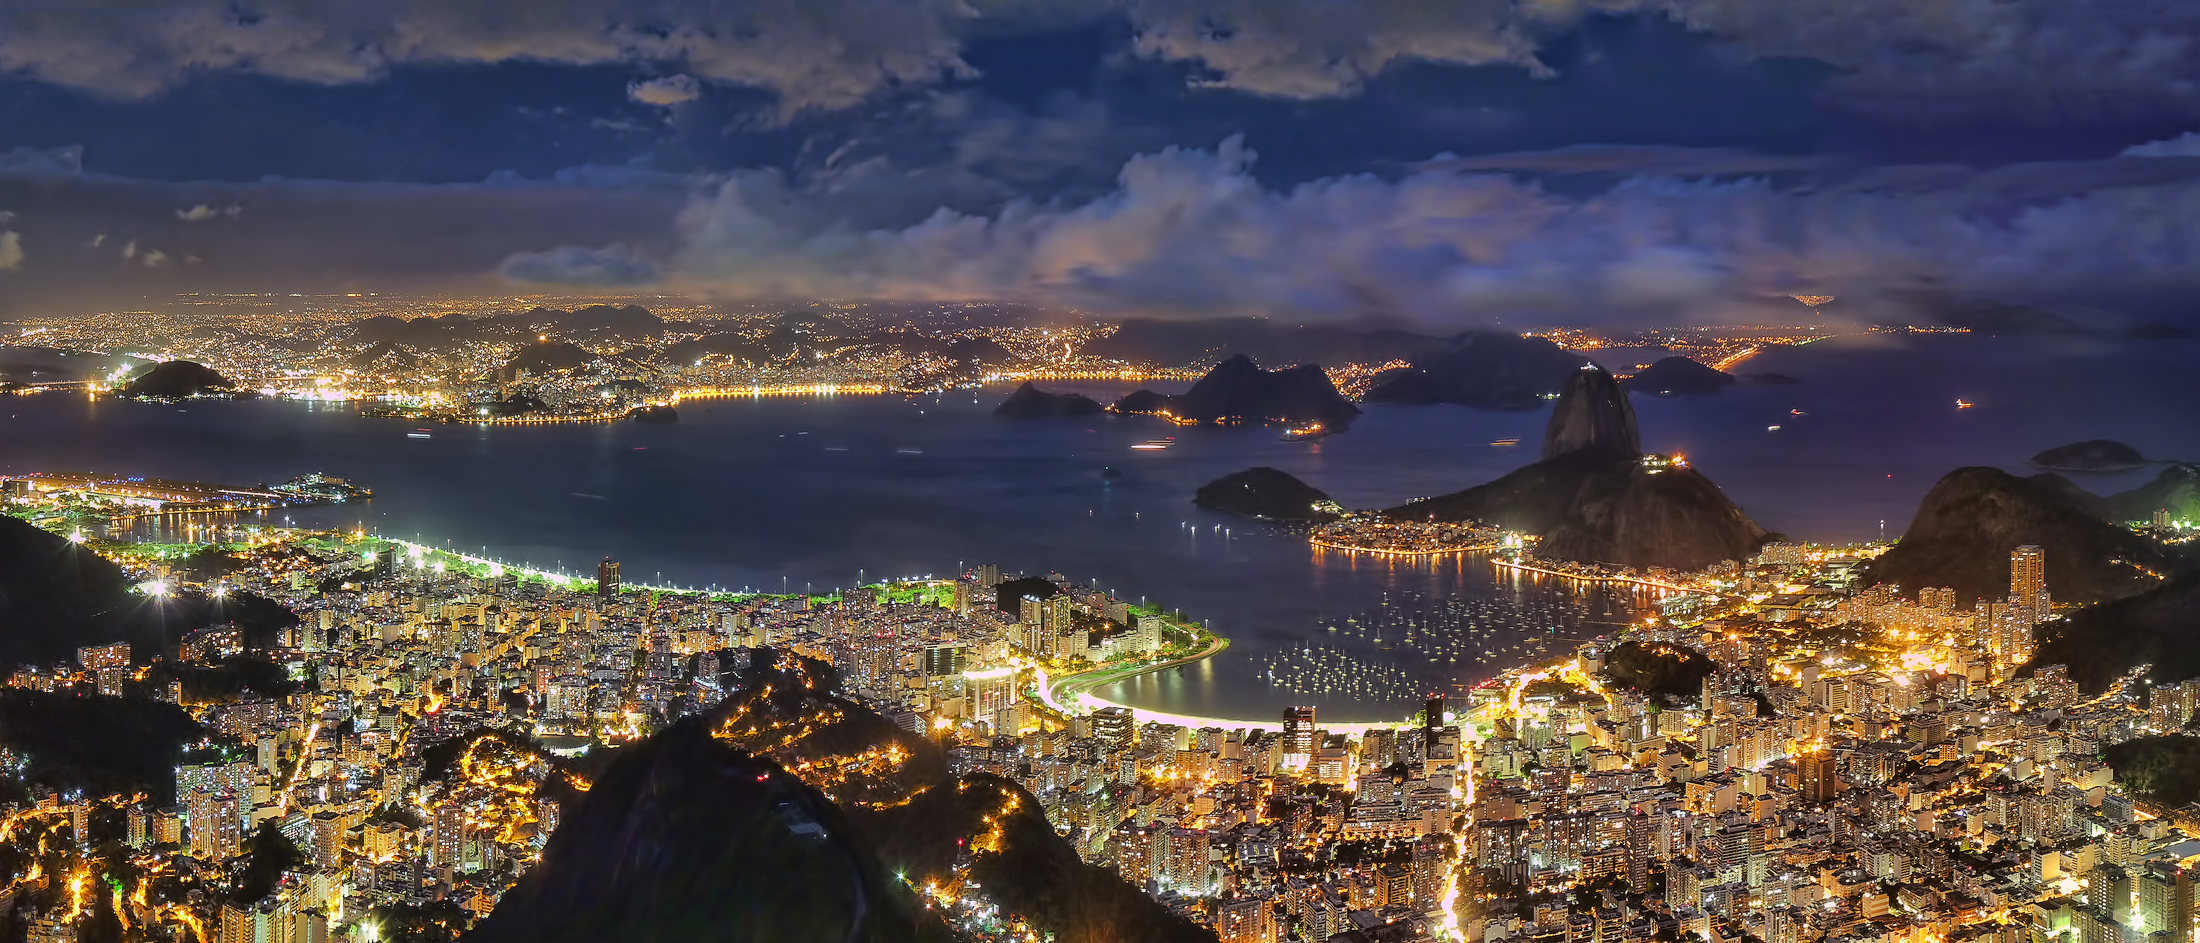 Rio de Janeiro, socha Krista či Copacabana. Čo všetko ponúka exotická oblasť Carioca?